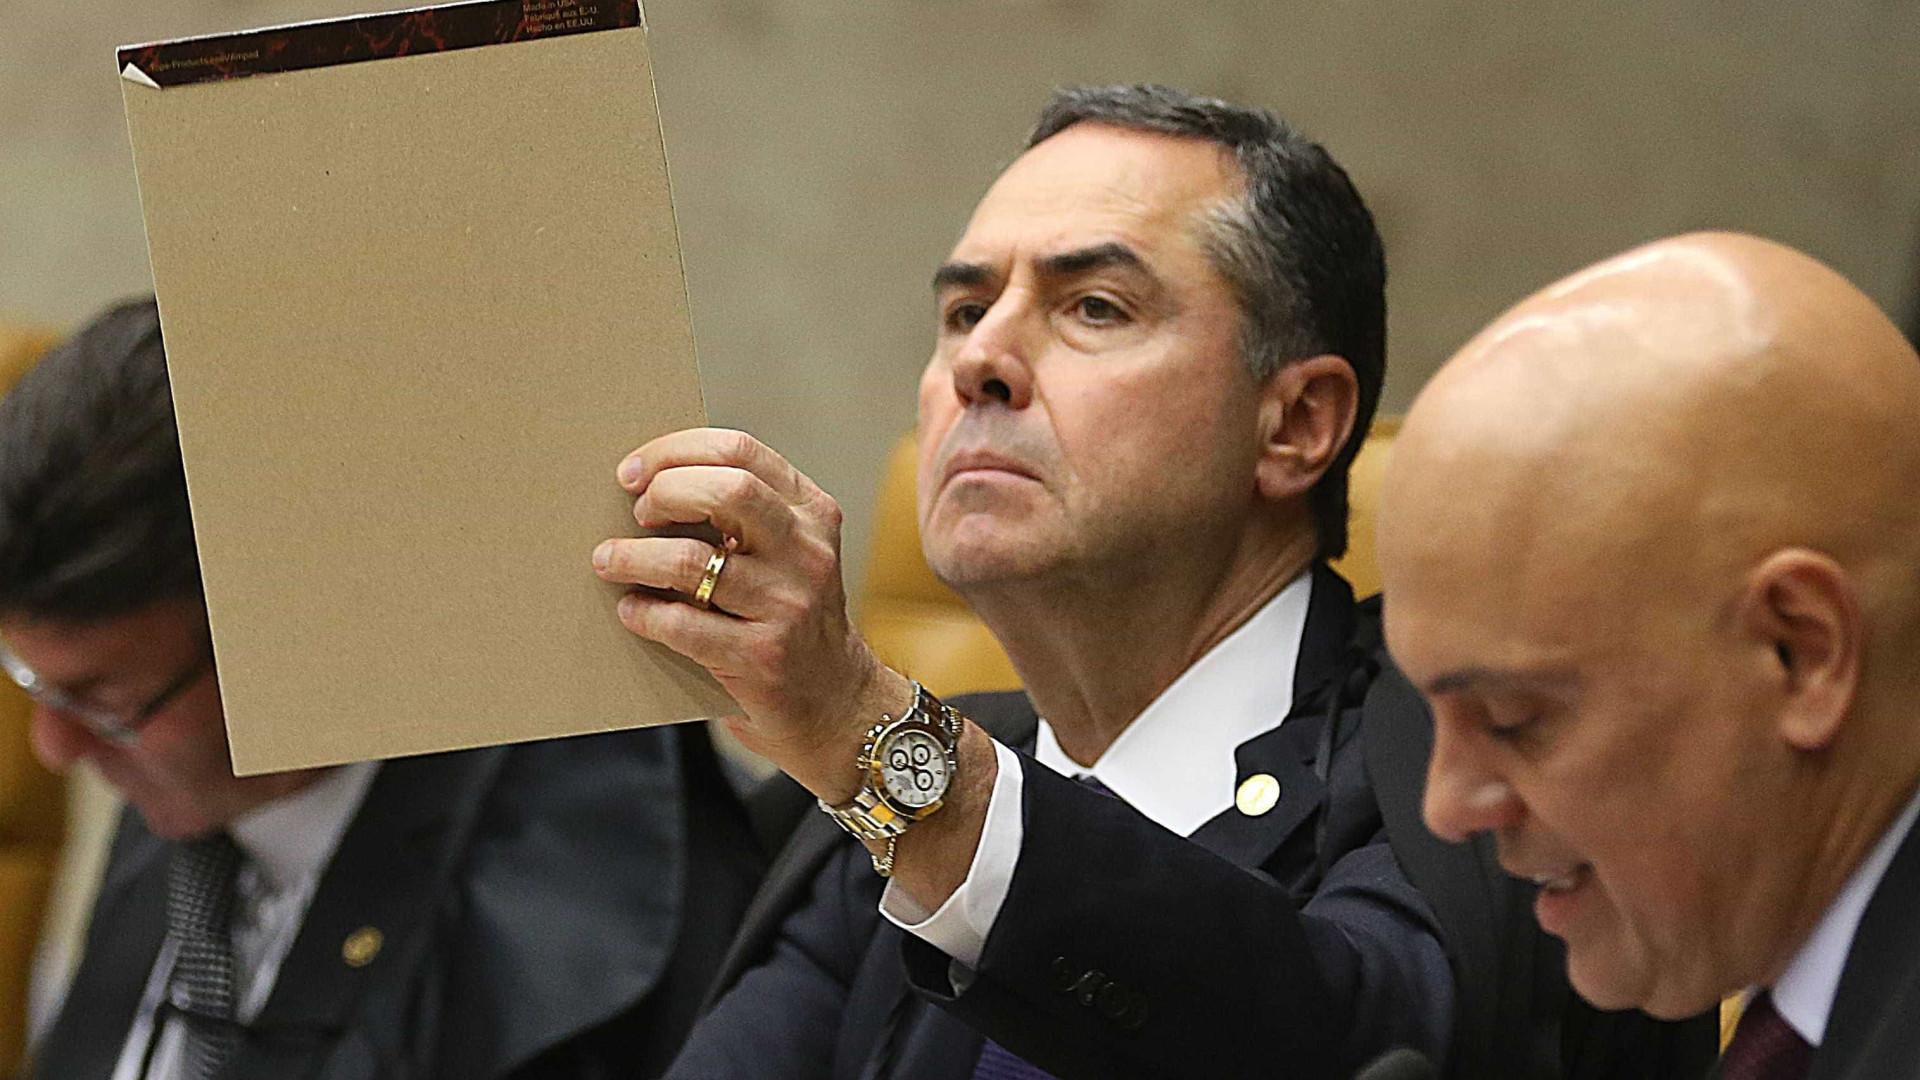 Barroso determina quebra de sigilo de Rocha Loures e coronel Lima — Urgente